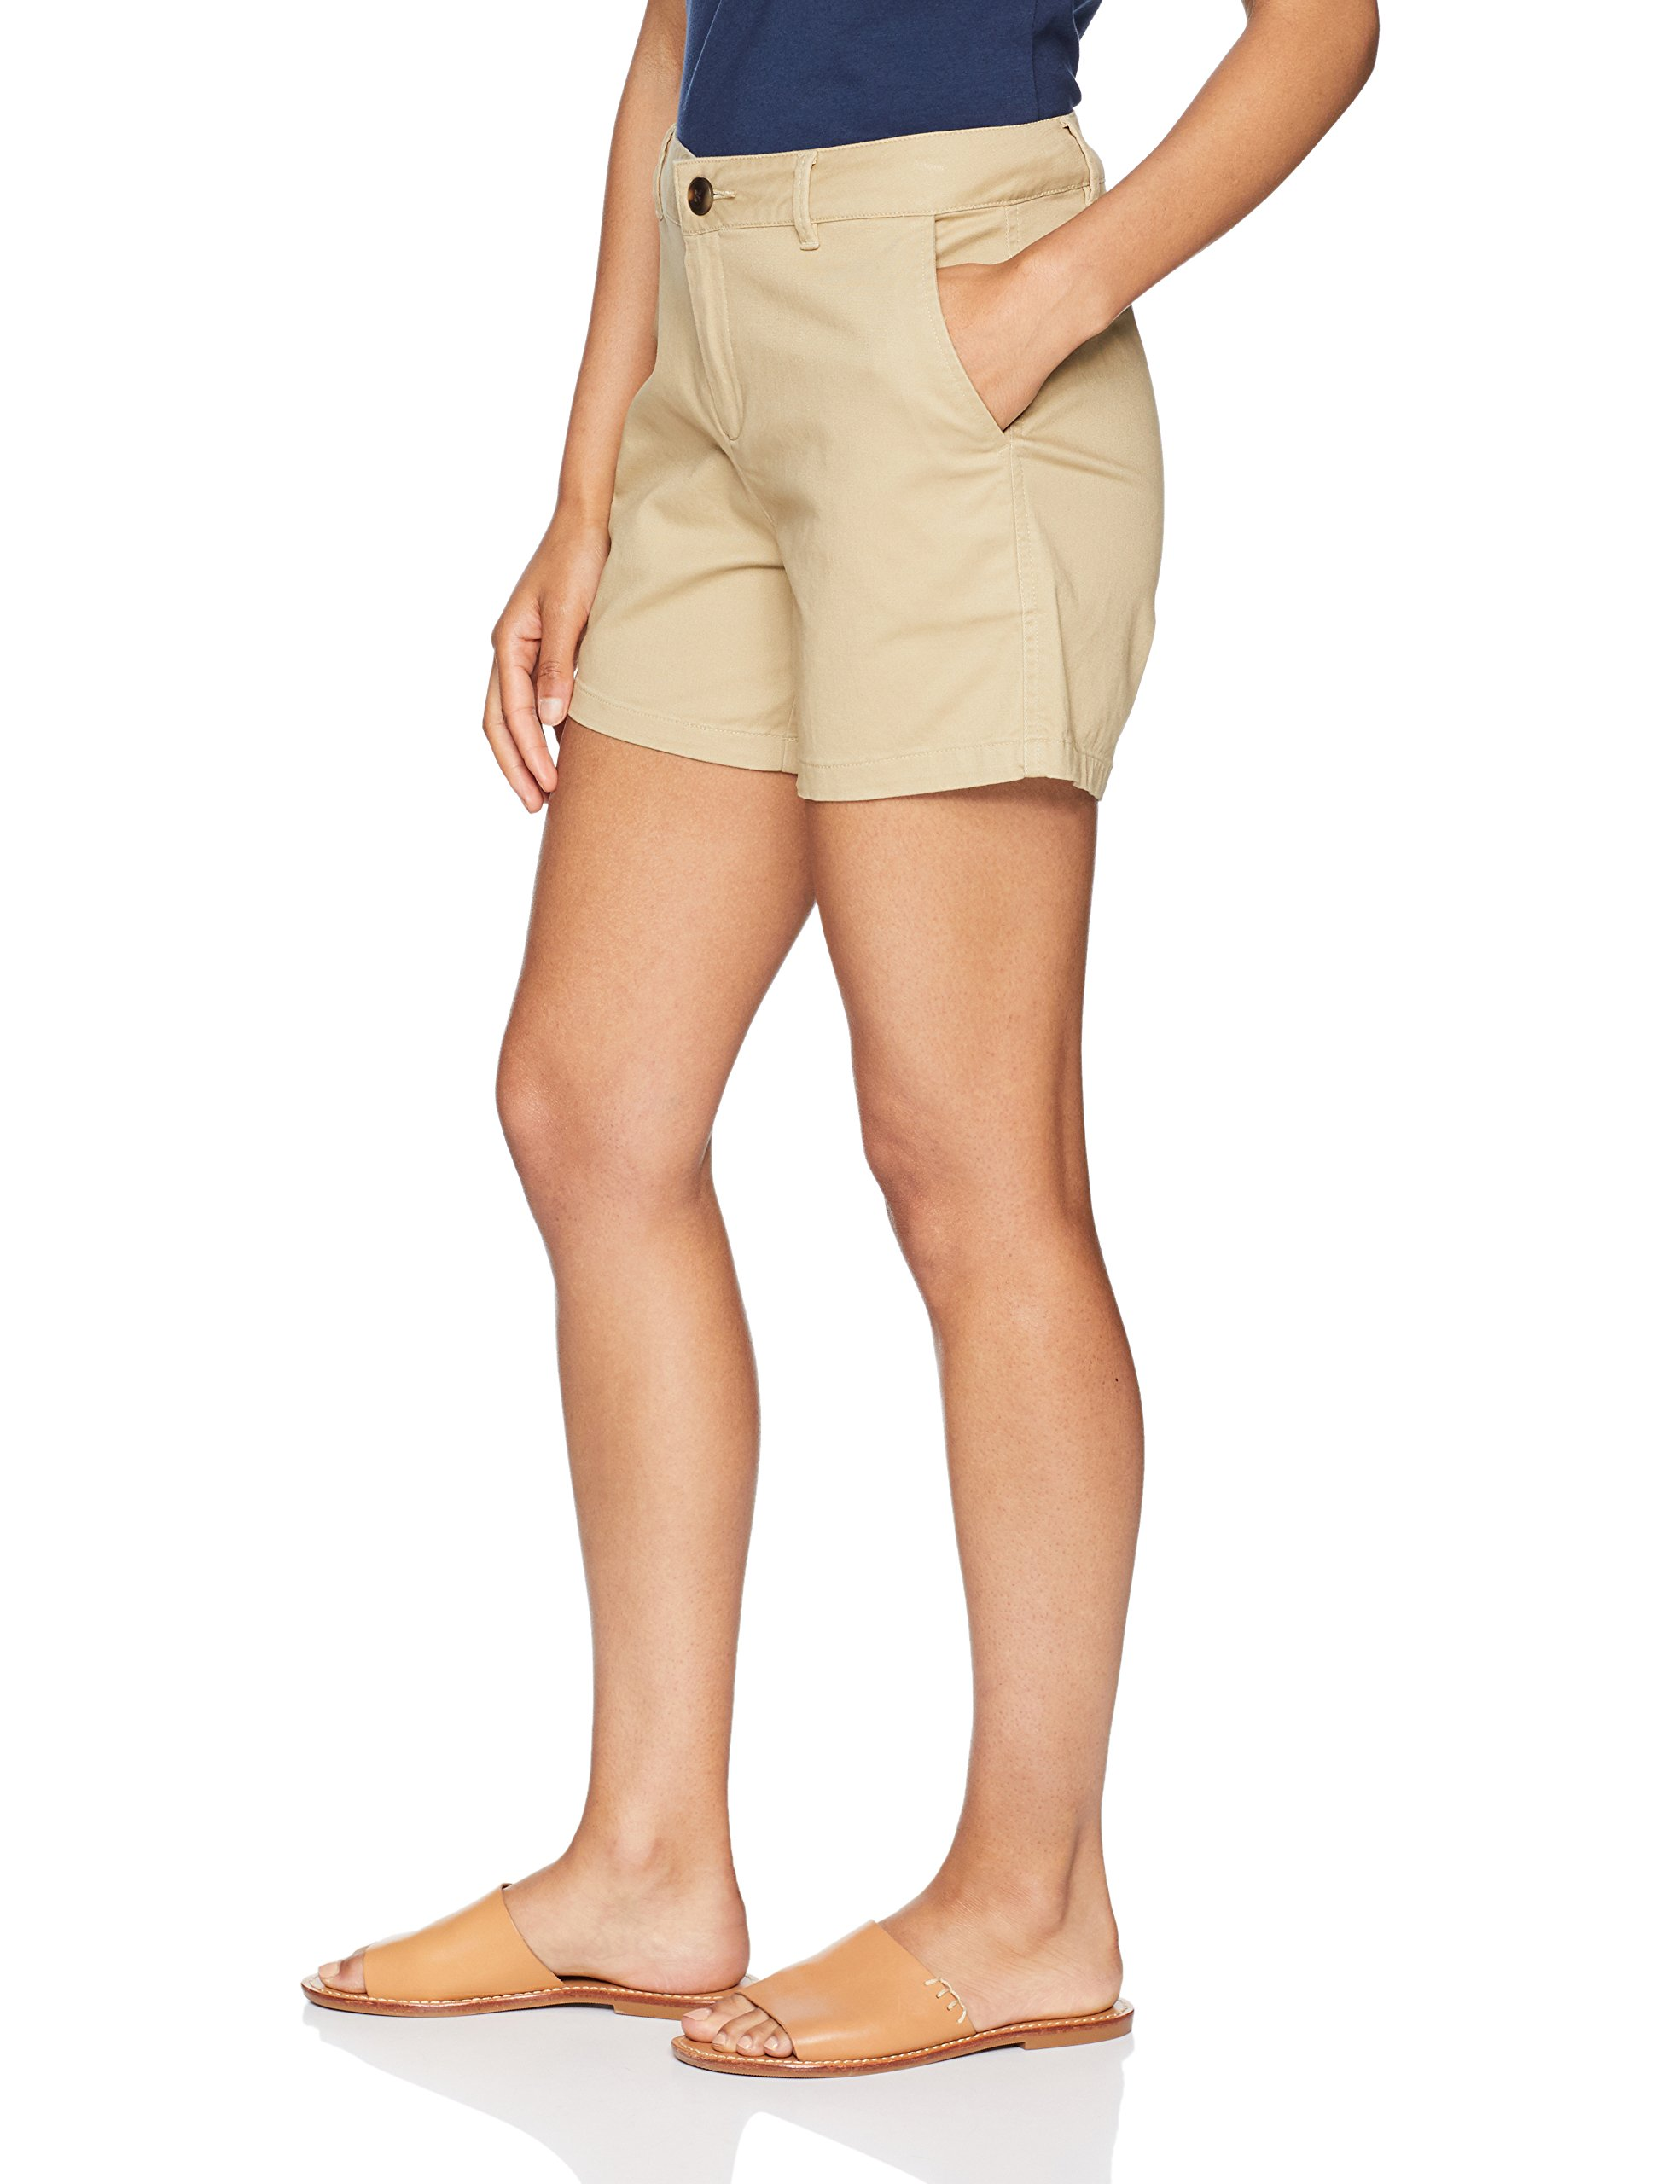 Amazon Essentials Women's 5'' Inseam Solid Chino Short Shorts, Khaki, 12 by Amazon Essentials (Image #4)